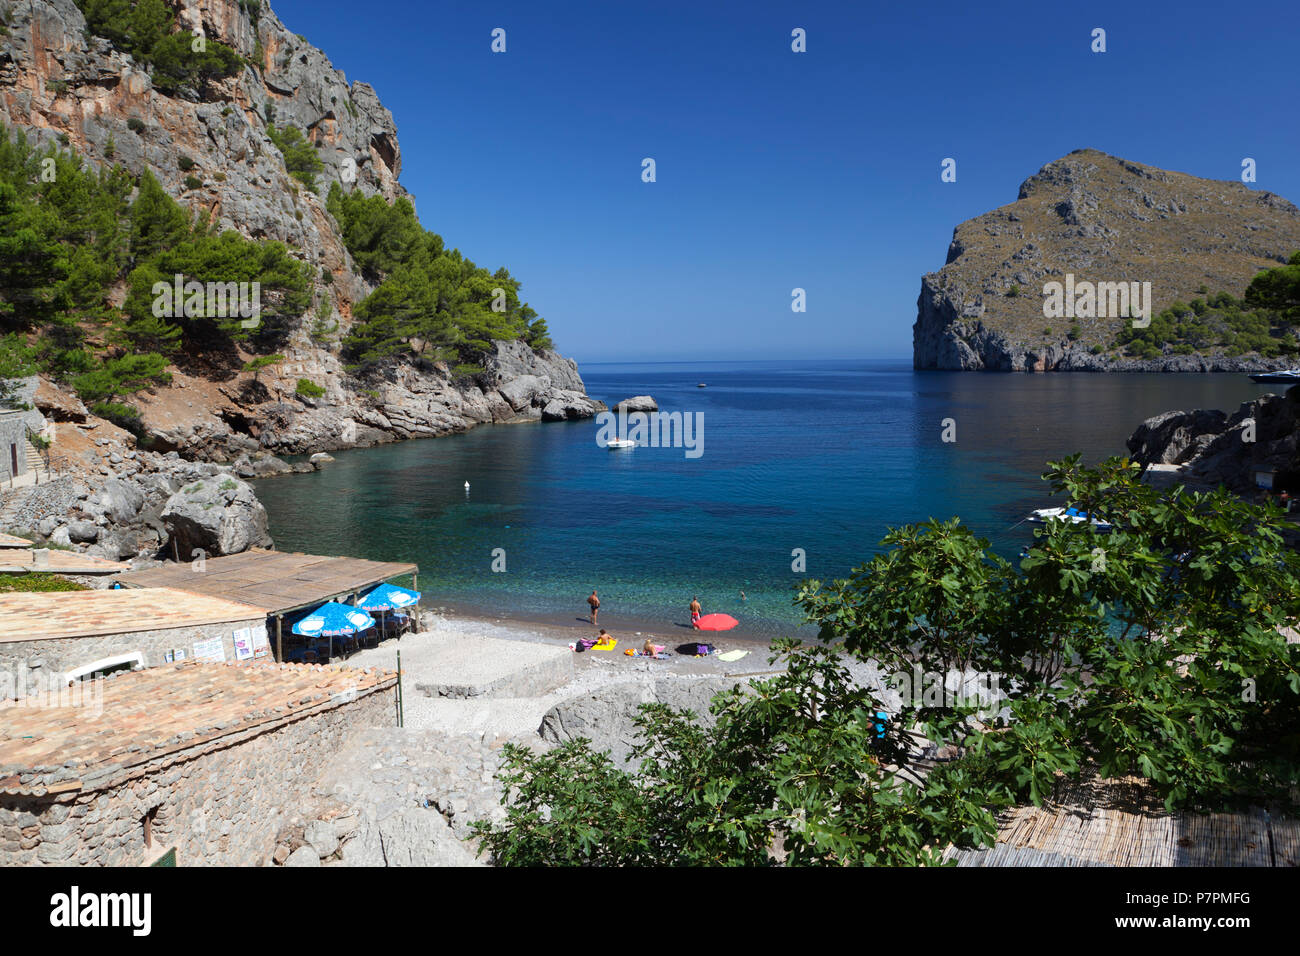 Beach view of Sa Calobra on Mallorca island - Stock Image